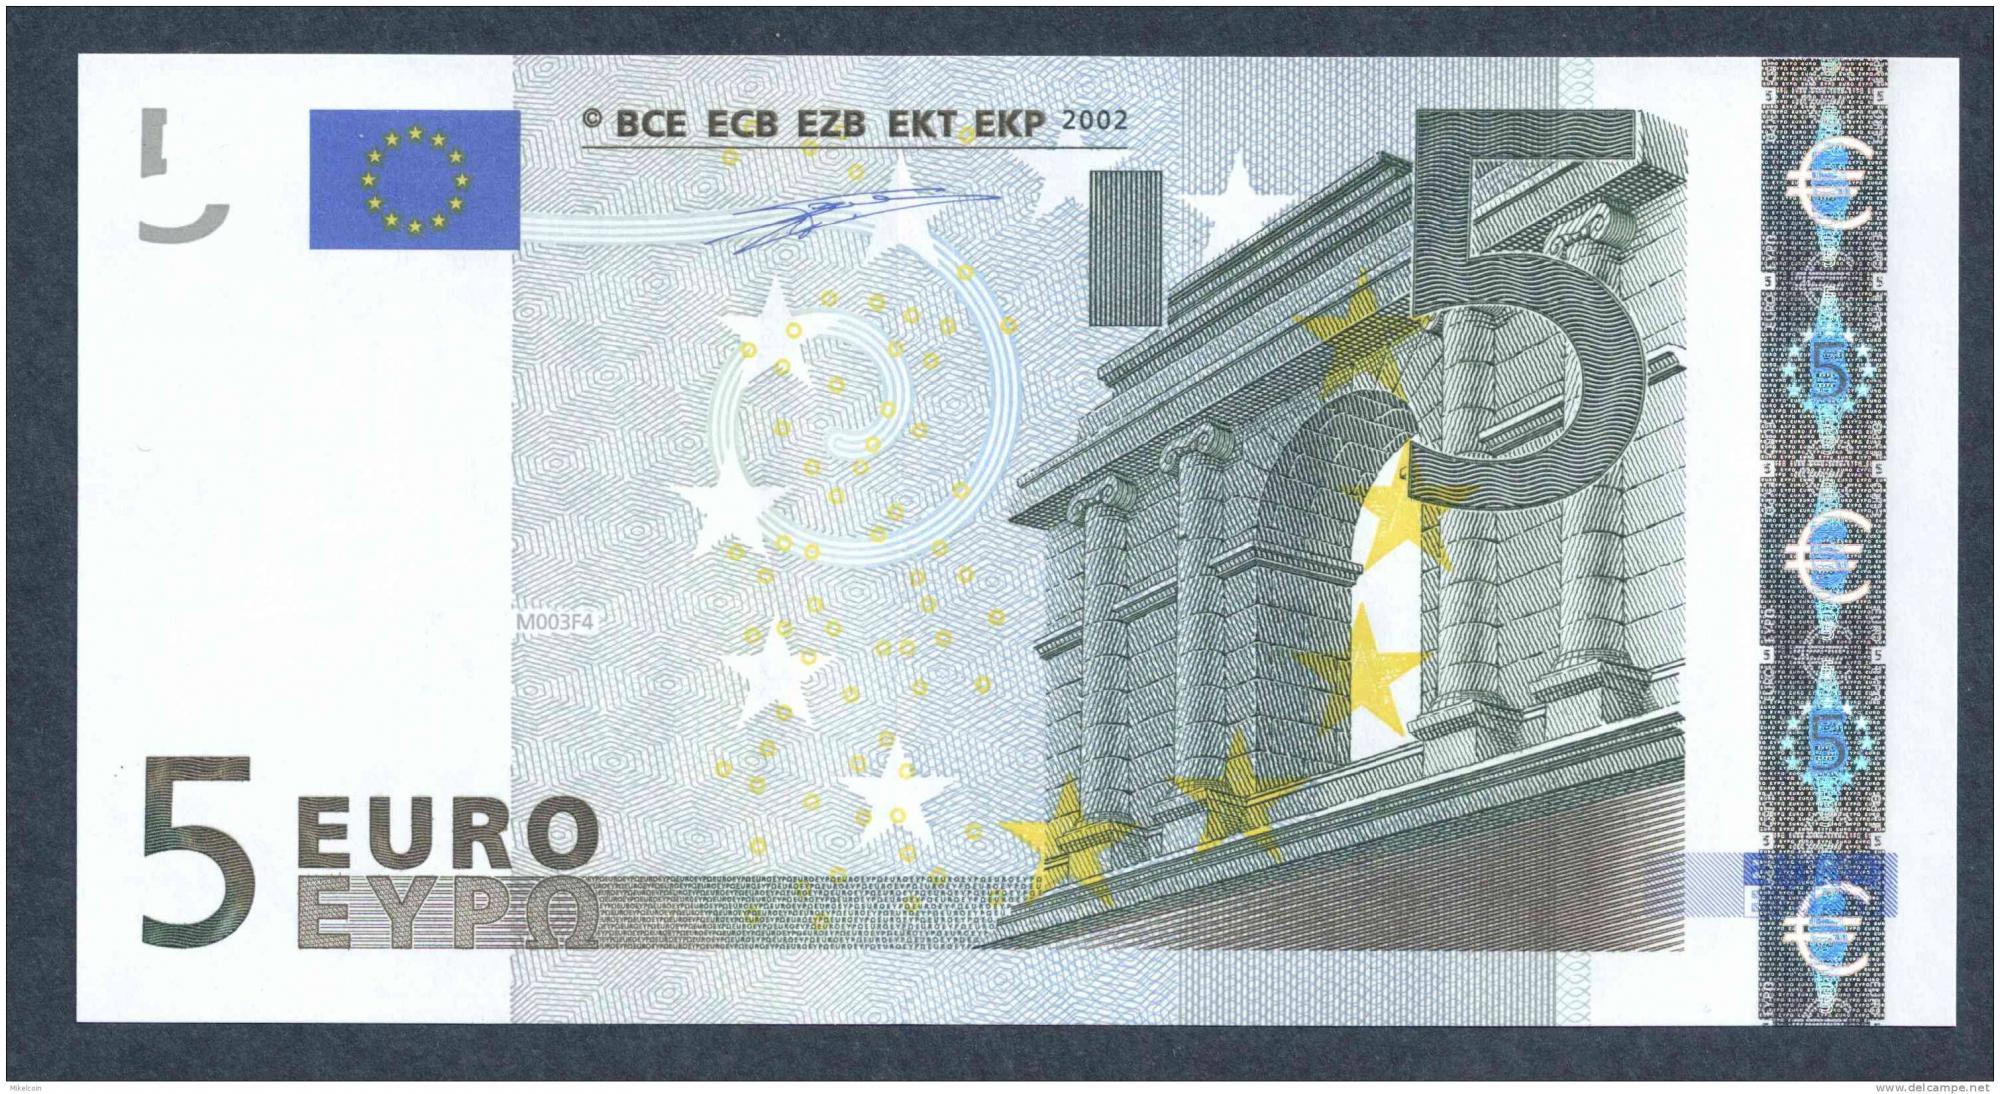 buecher.de gutscheincode 5 euro